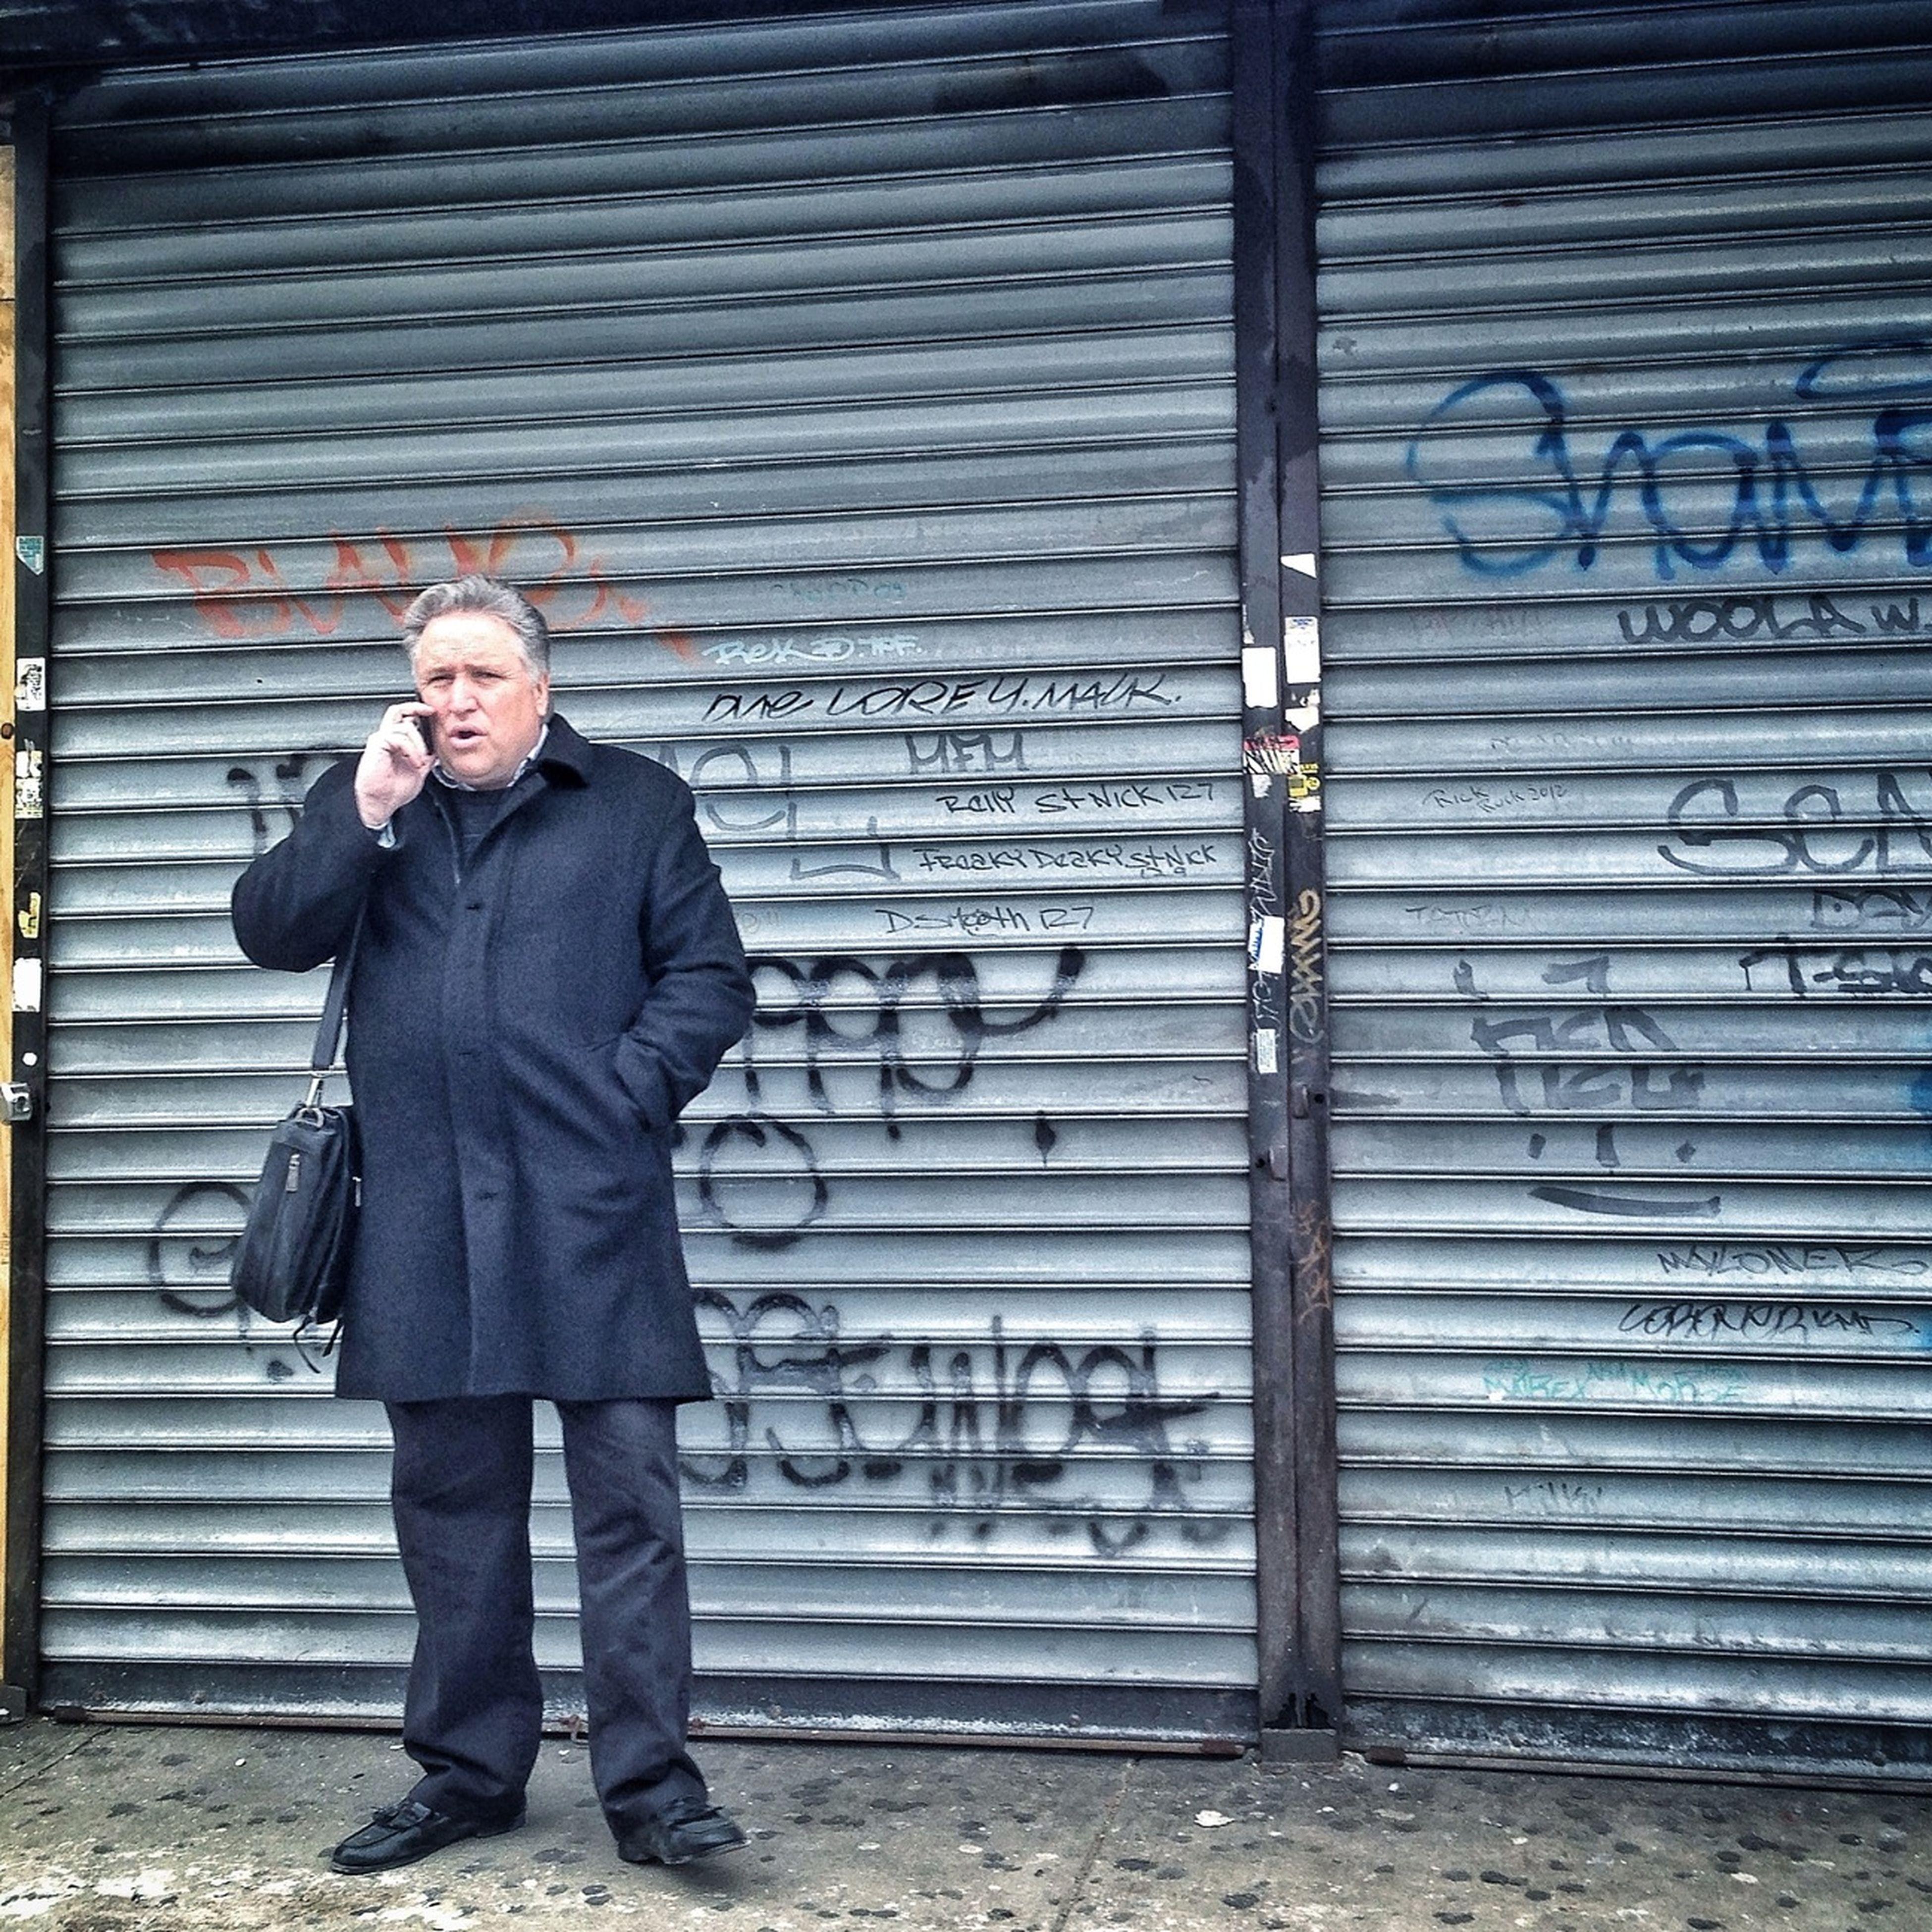 Streetphotography Street Photography AMPt - Street